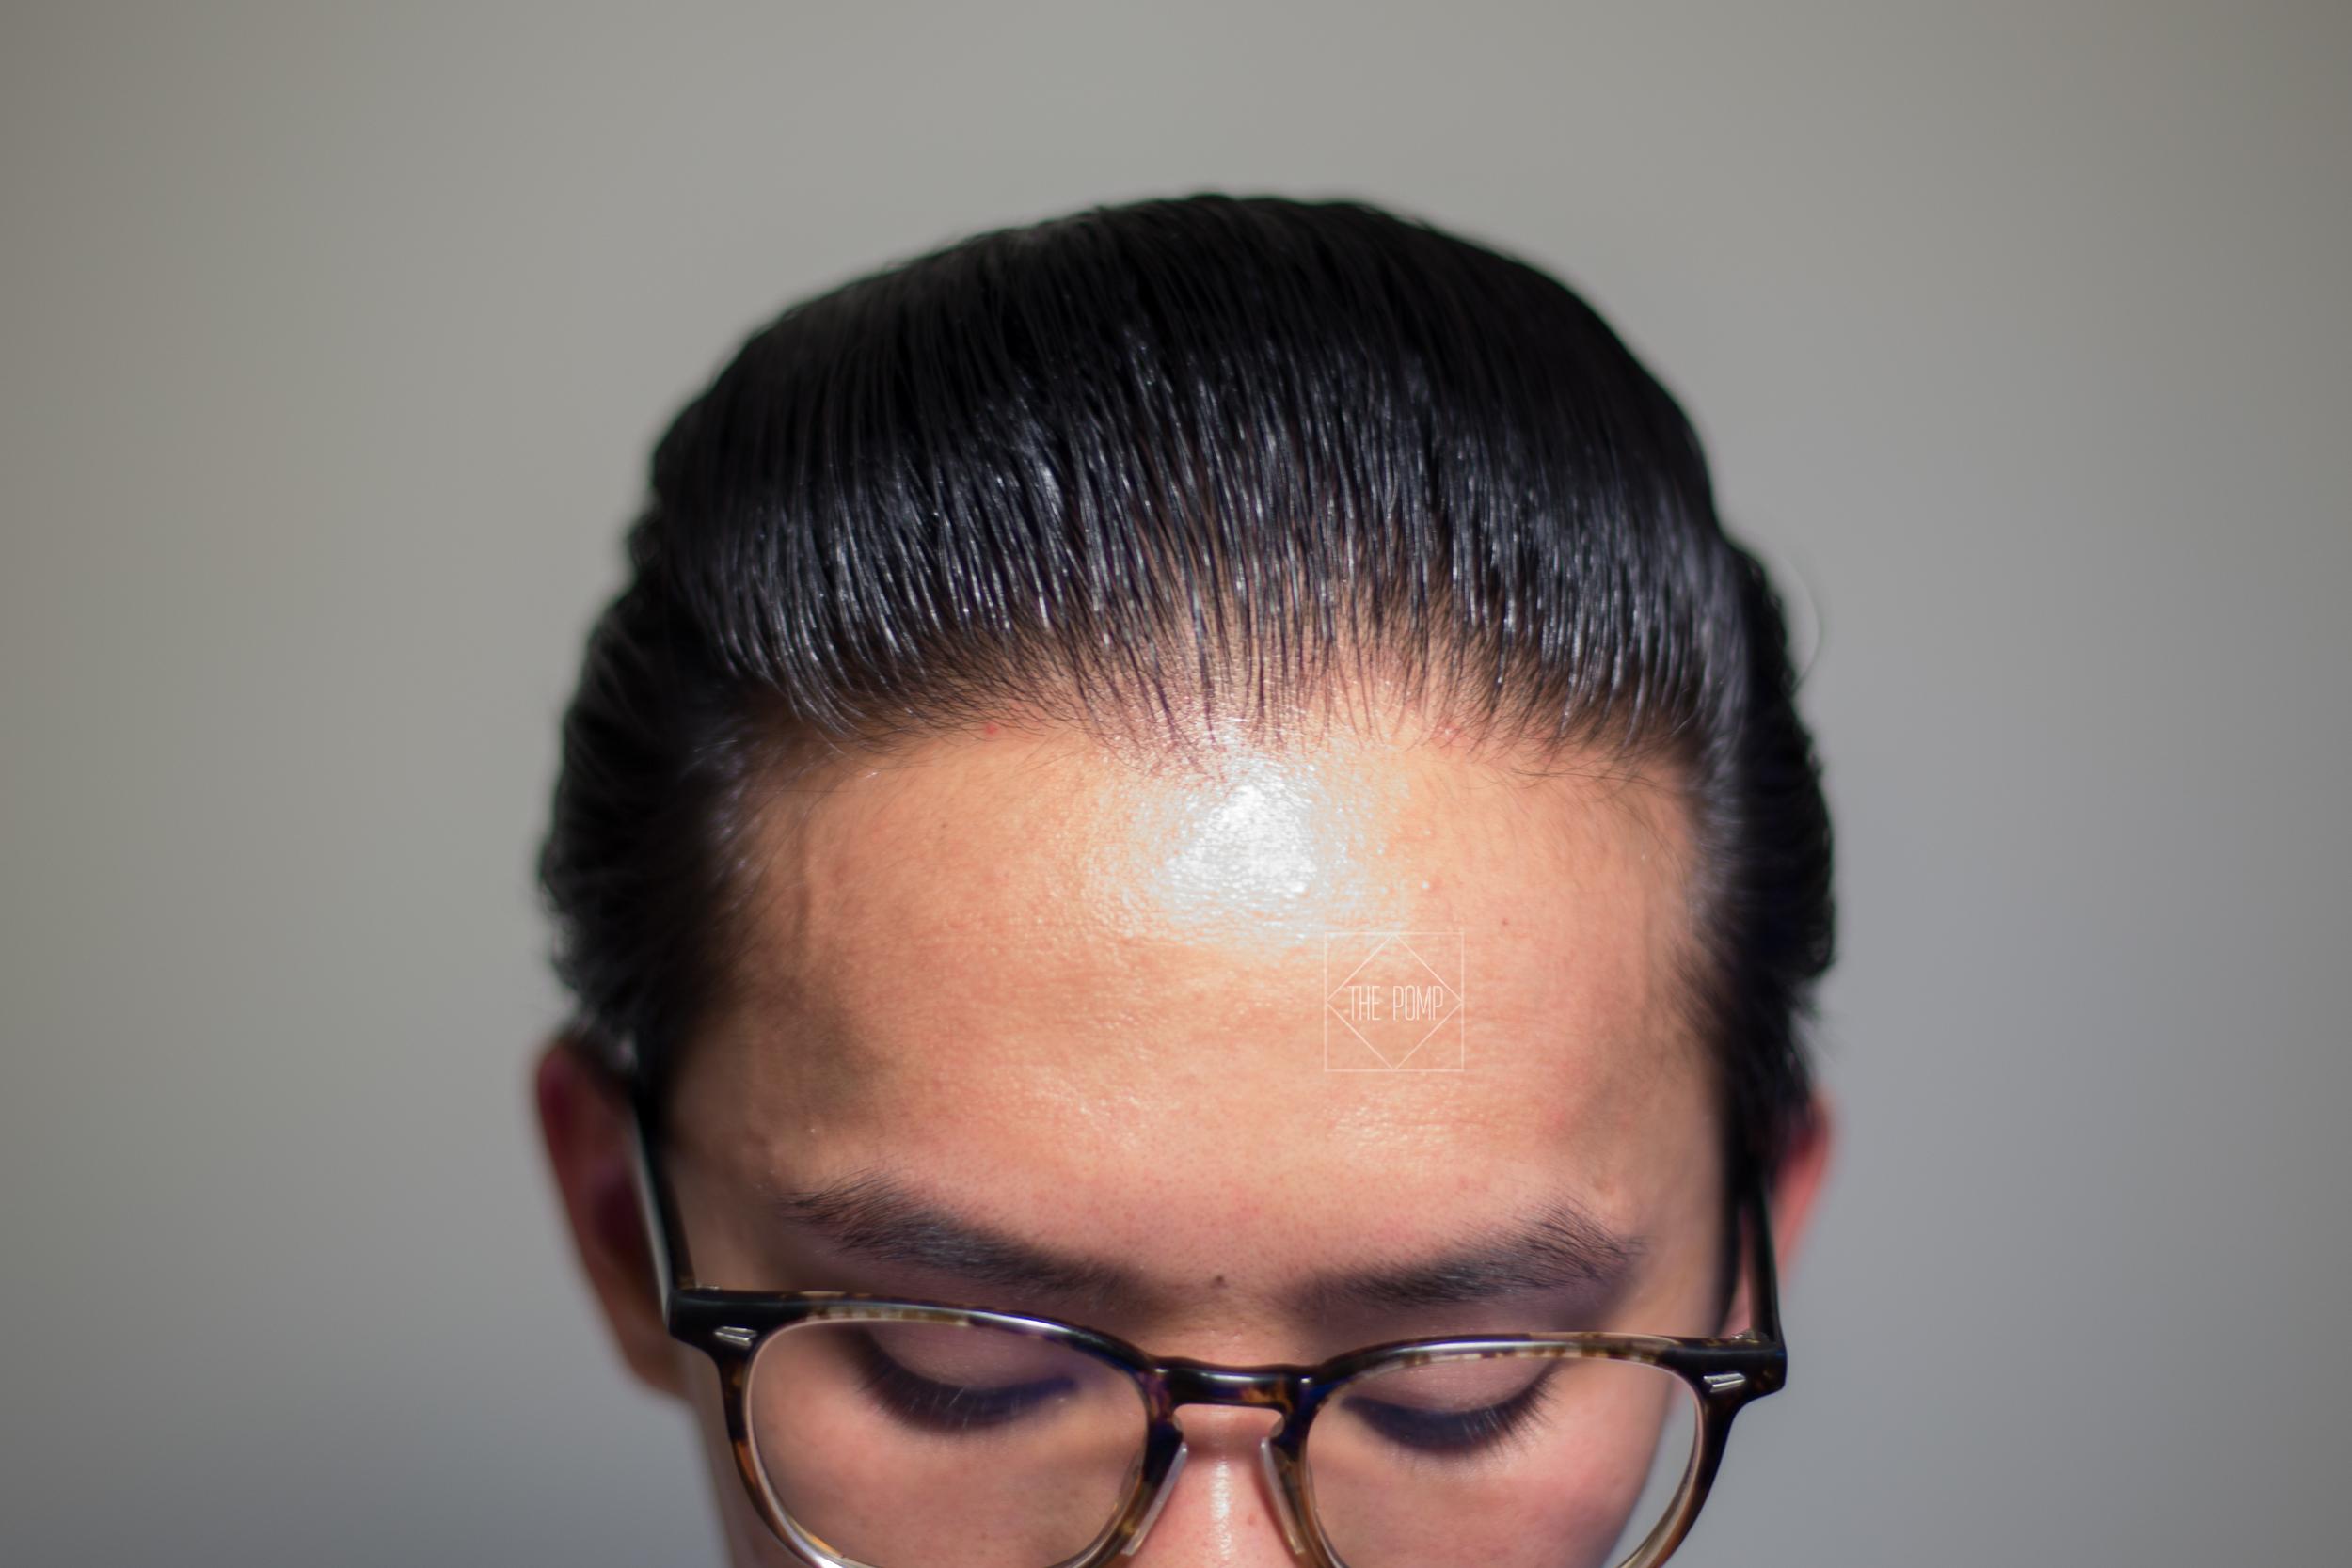 Crownes & Combes Premium Pomade final pomp